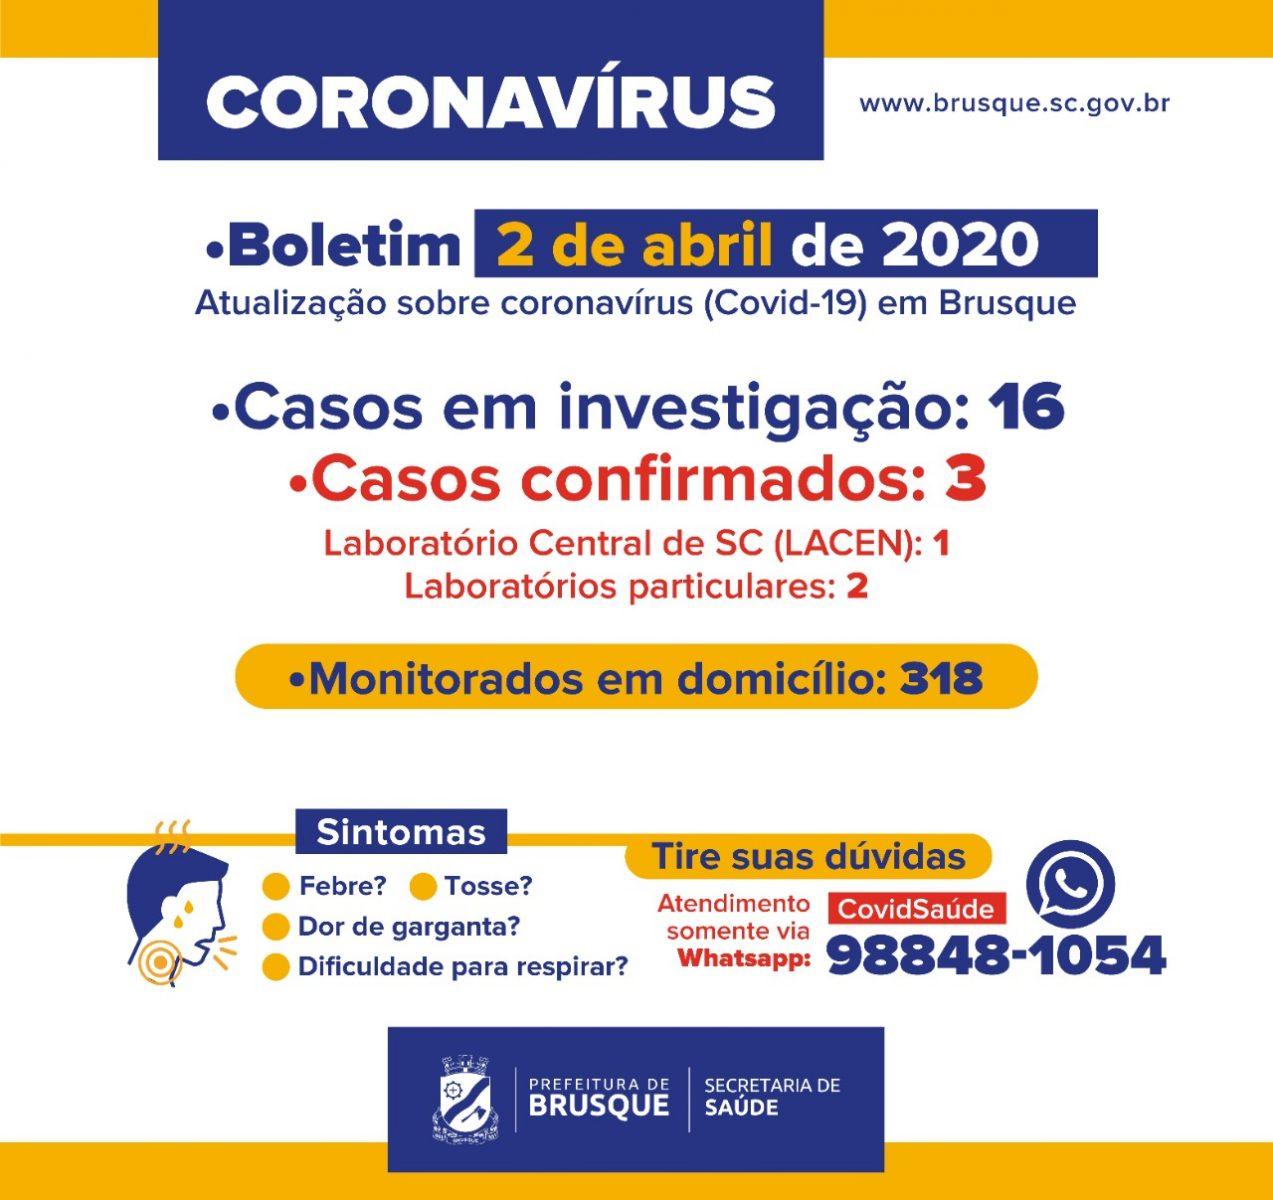 Confira o Boletim Epidemiológico desta quinta-feira (2)